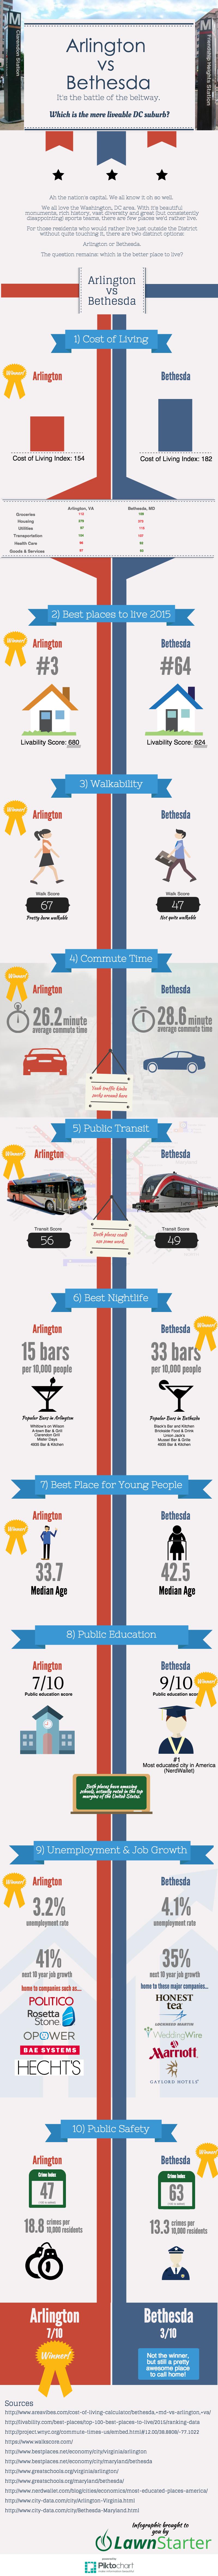 arlington vs bethesda